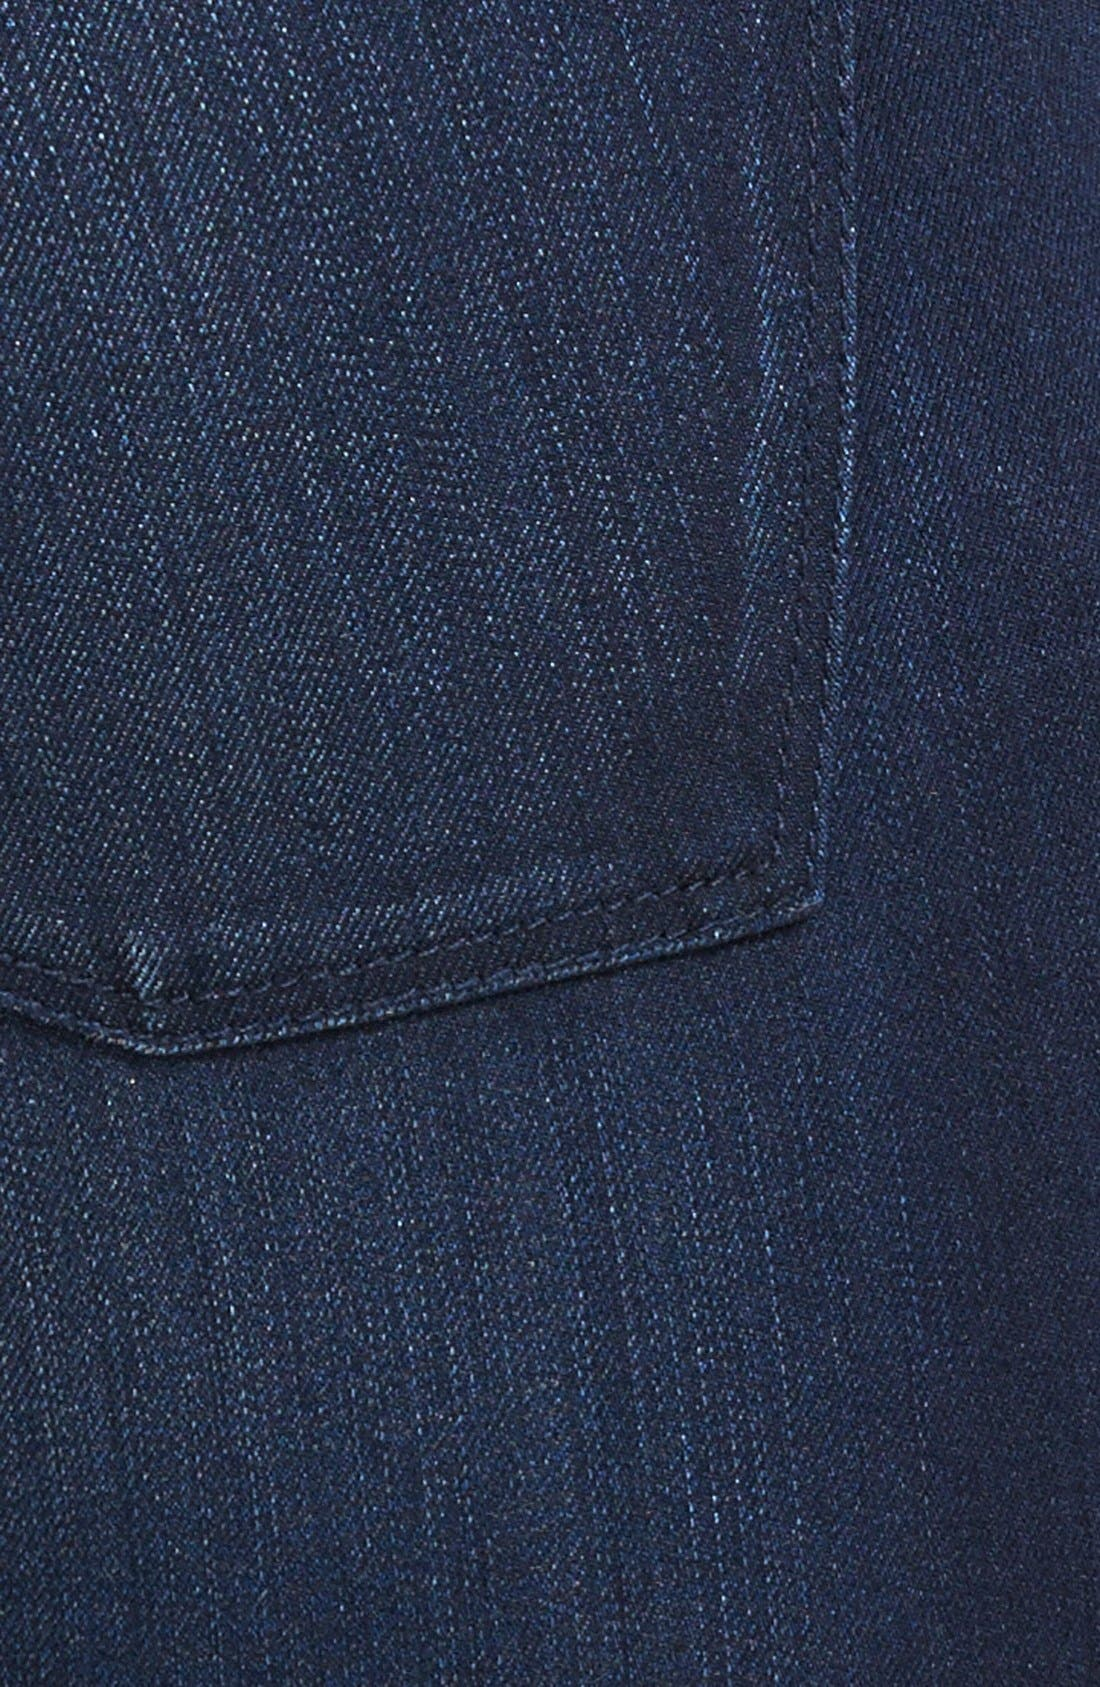 Alternate Image 3  - DL1961 'Emma' Power Legging Jeans (Berlin)